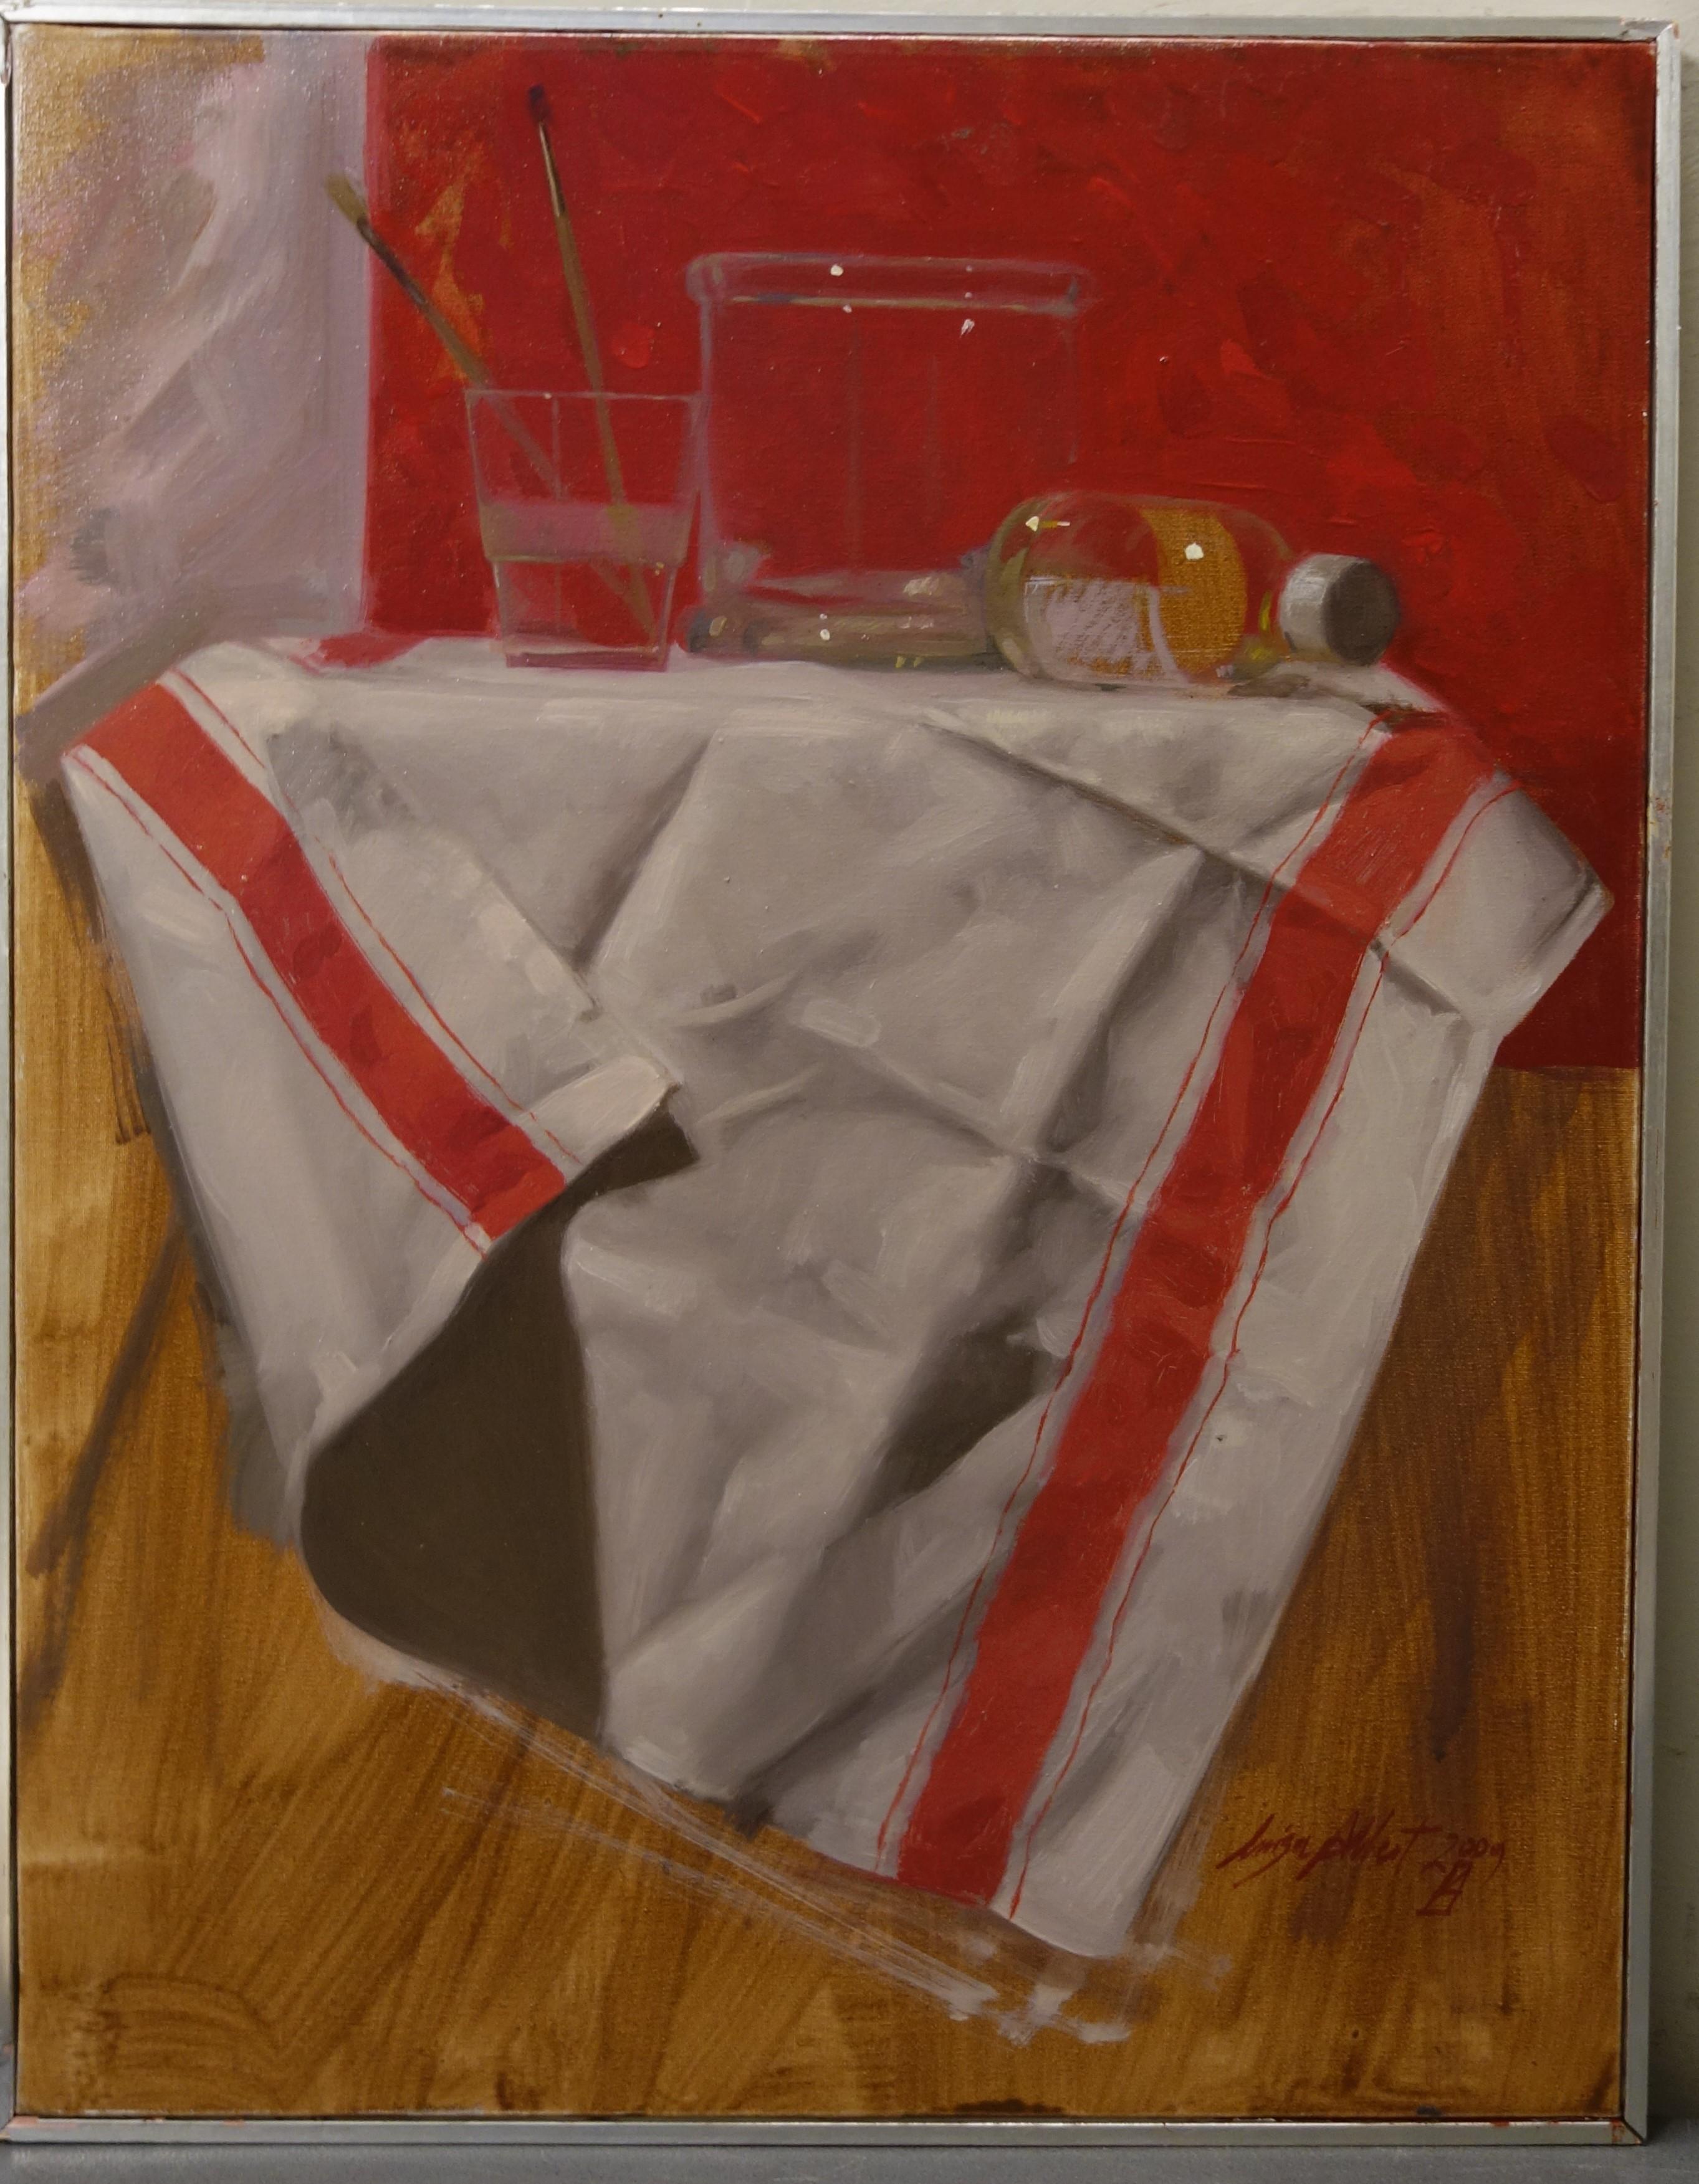 """Transparencies"" Red, White, Still life, Glasses, Kitchen cm. 37 x 47"